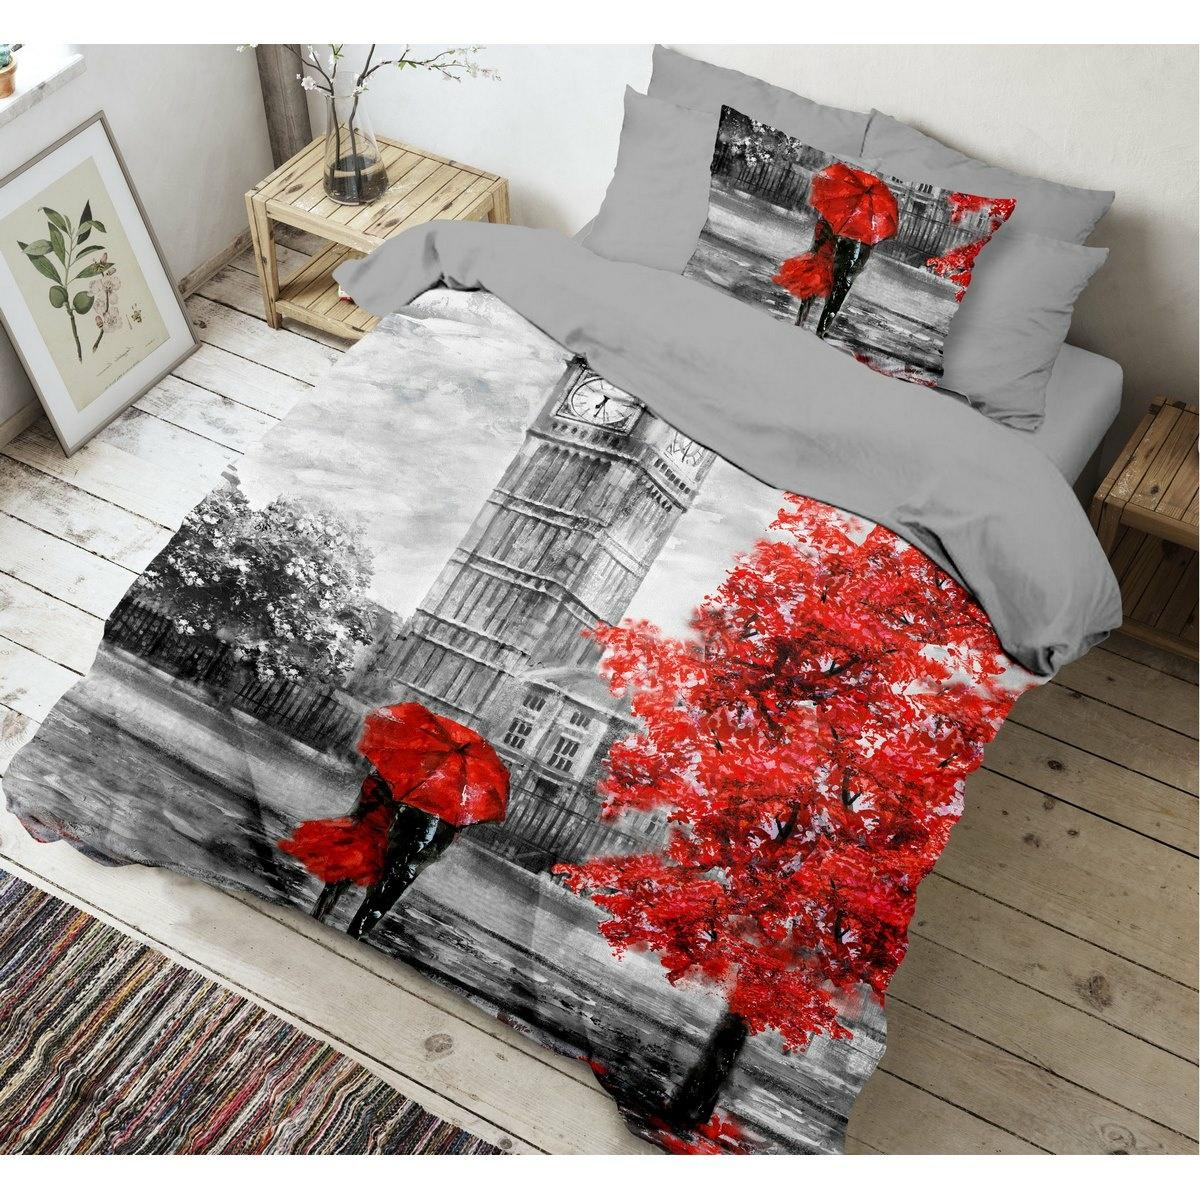 Kvalitex Bavlnené obliečky Umbrella 3D, 140 x 200 cm, 70 x 90 cm